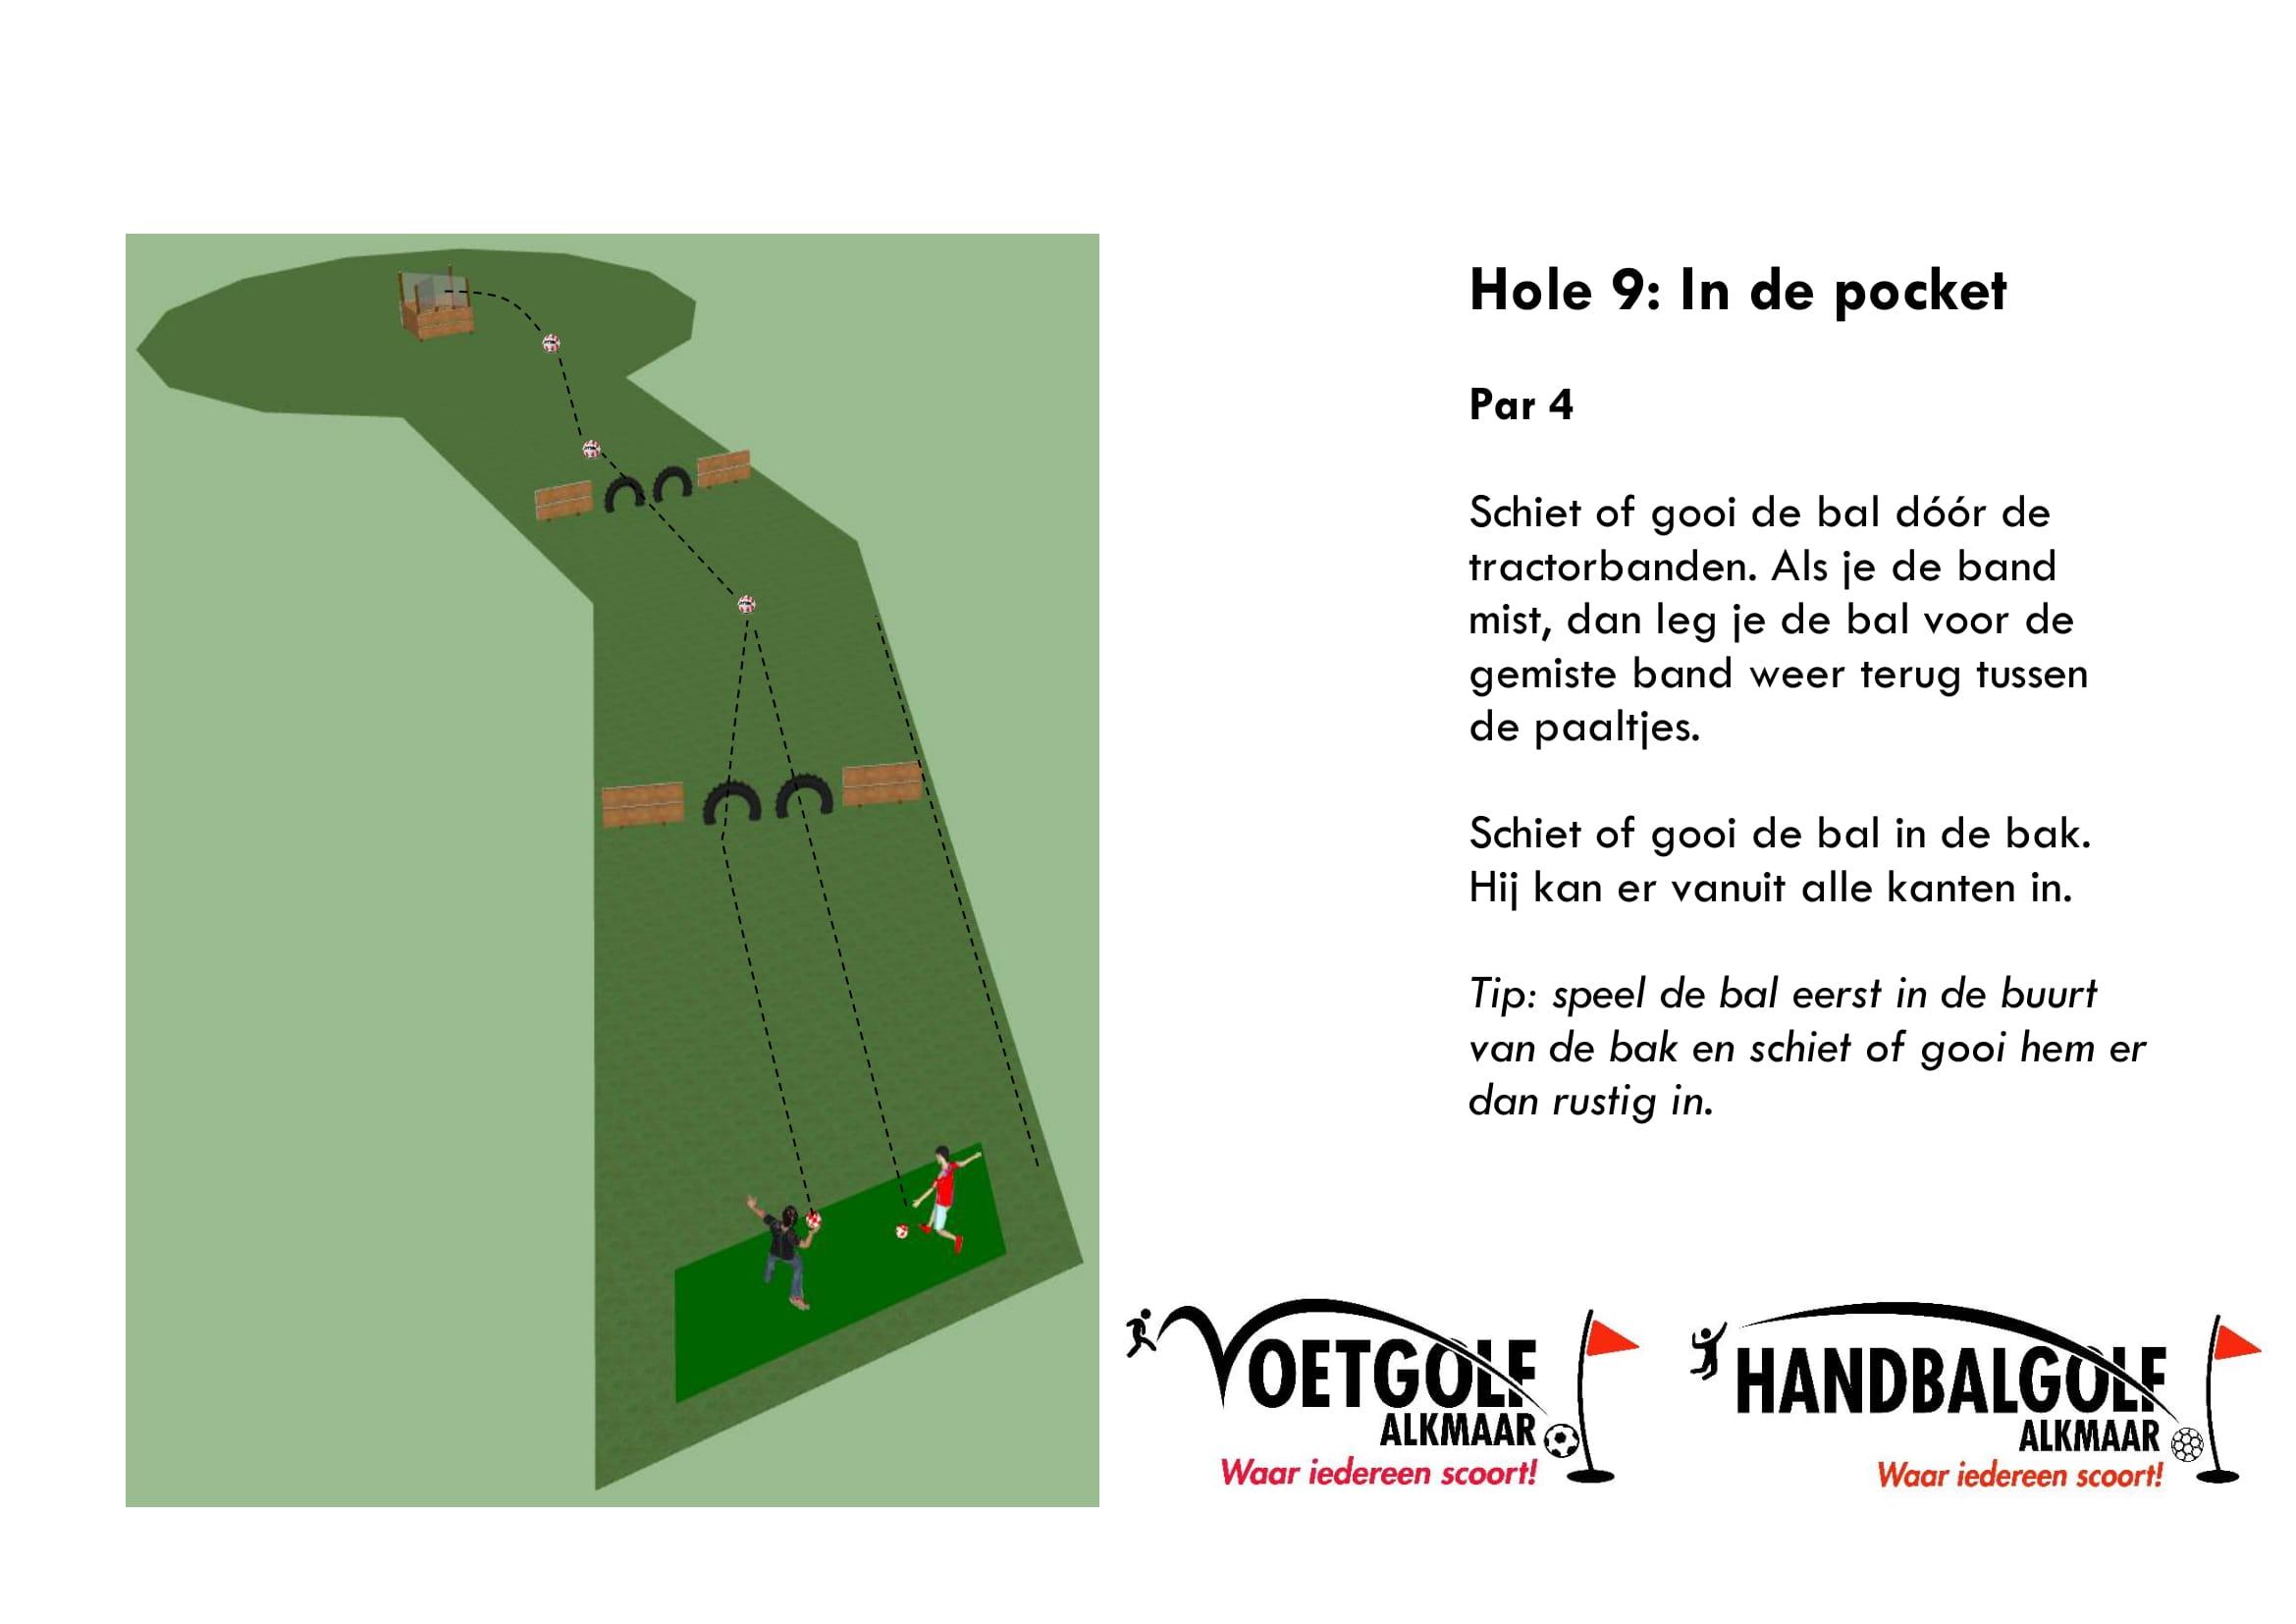 hole 9 met handbal